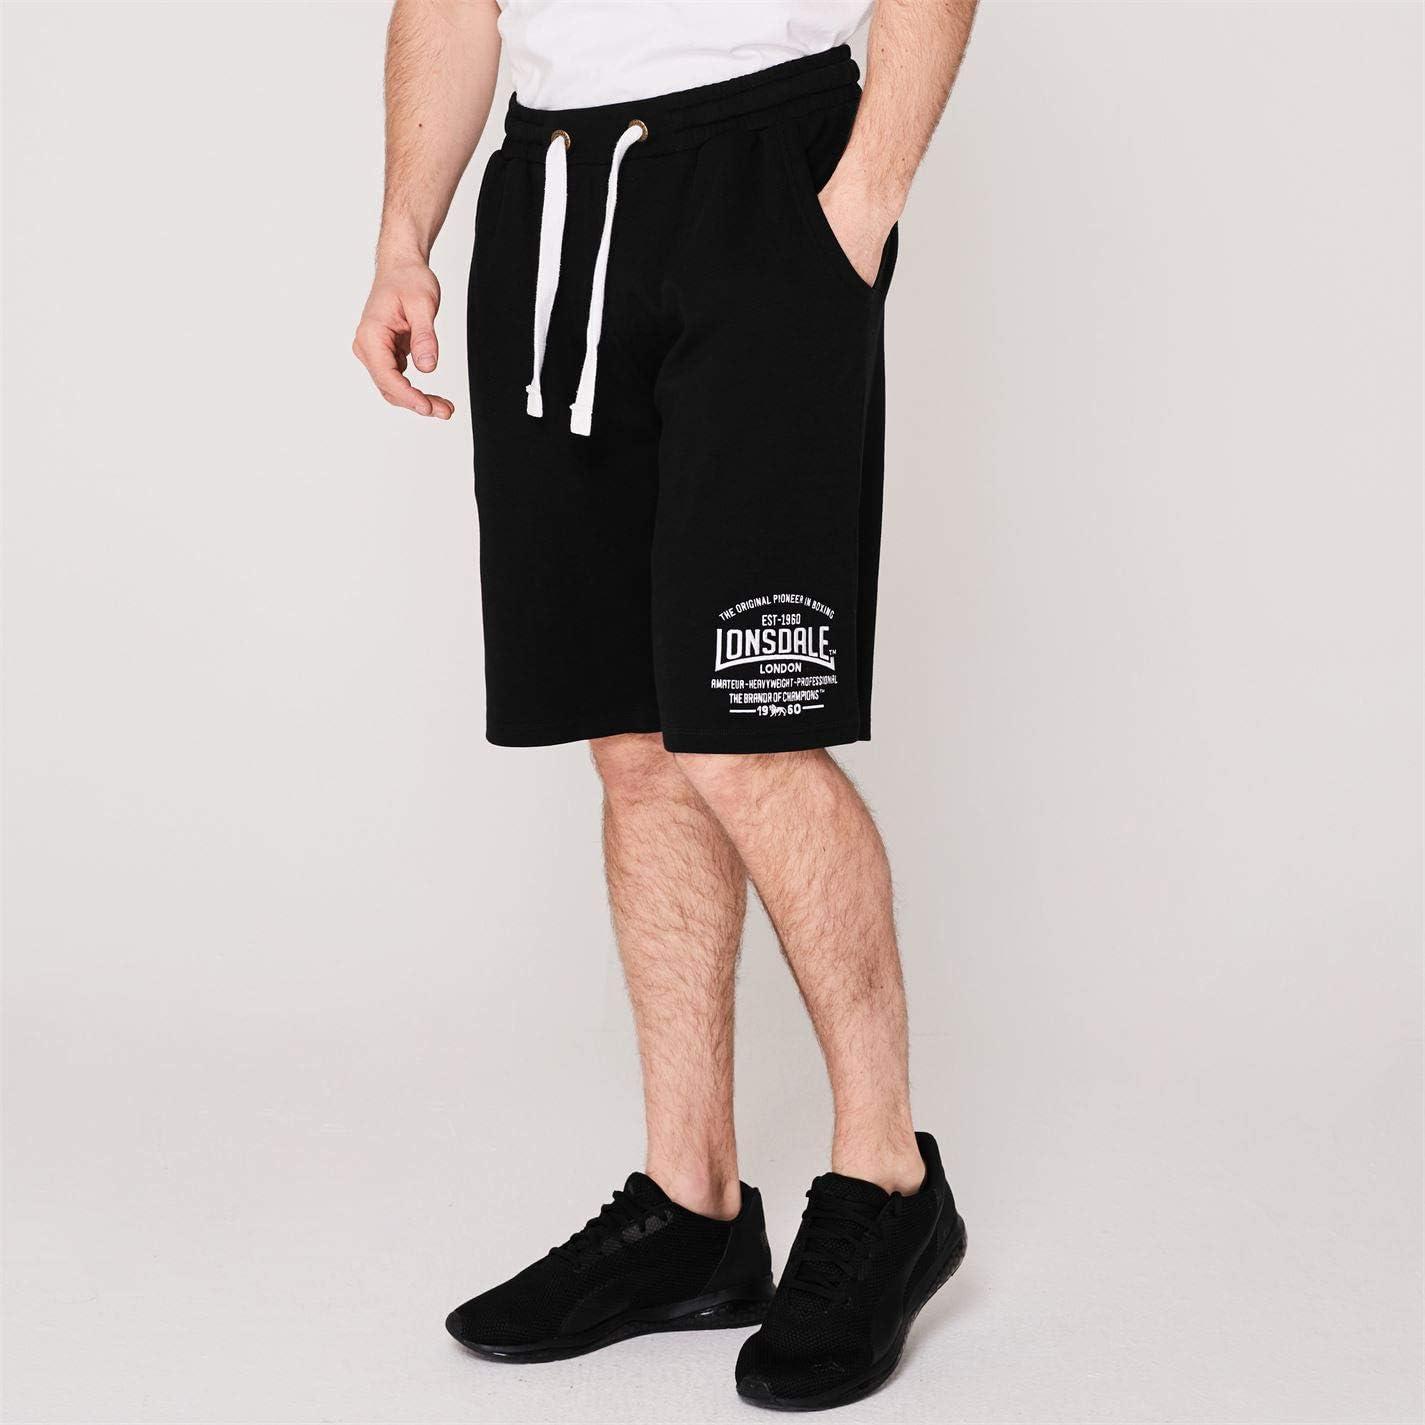 Lonsdale Pantaloncini da Pugilato Leggeri Uomo